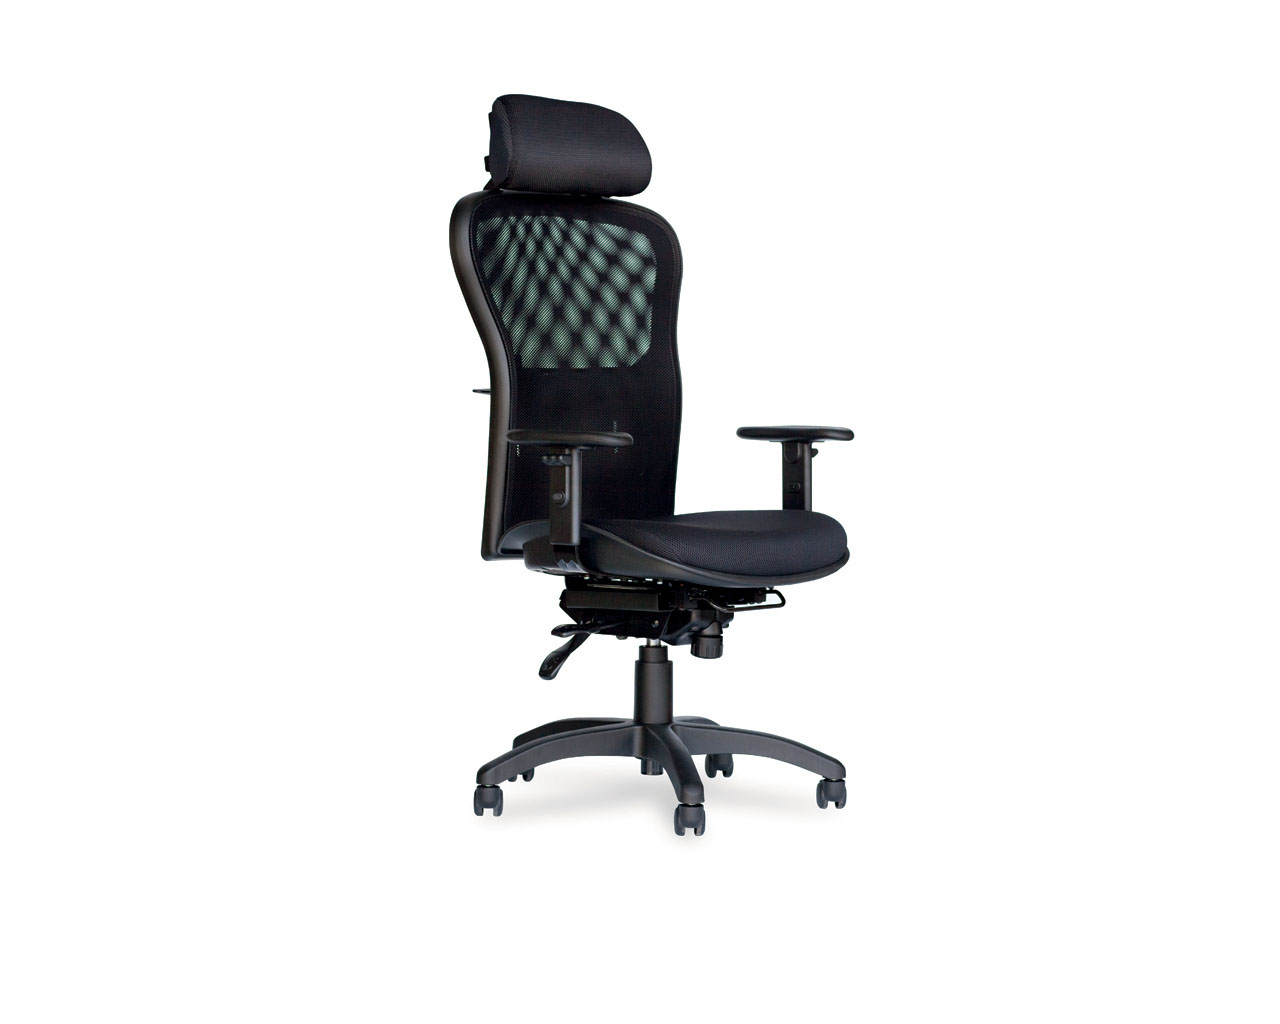 Enduro High Back With Optional Headrest